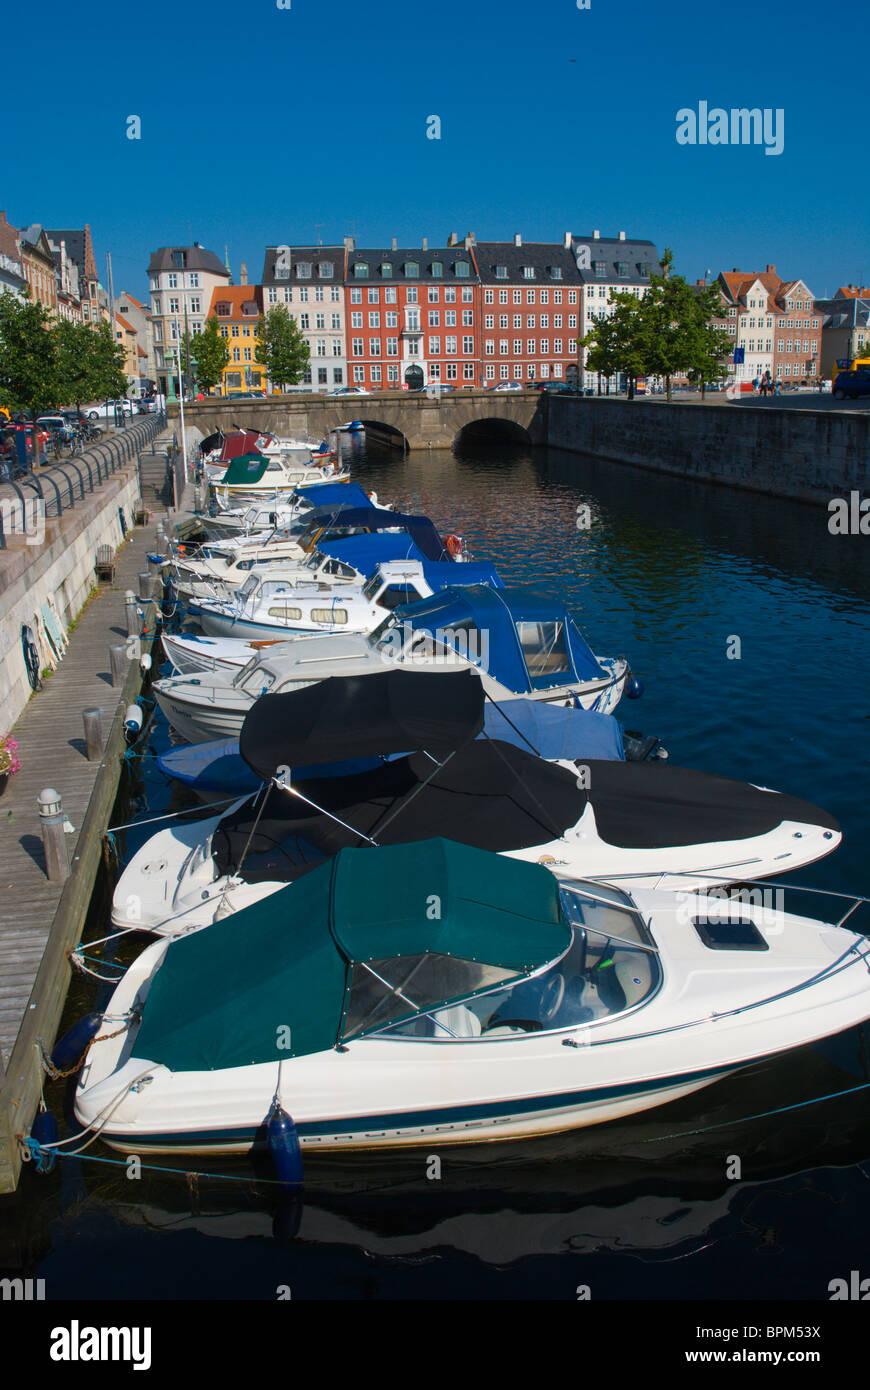 Frederiksholms canal at Slotsholmen island central Copenhagen Denmark Europe - Stock Image